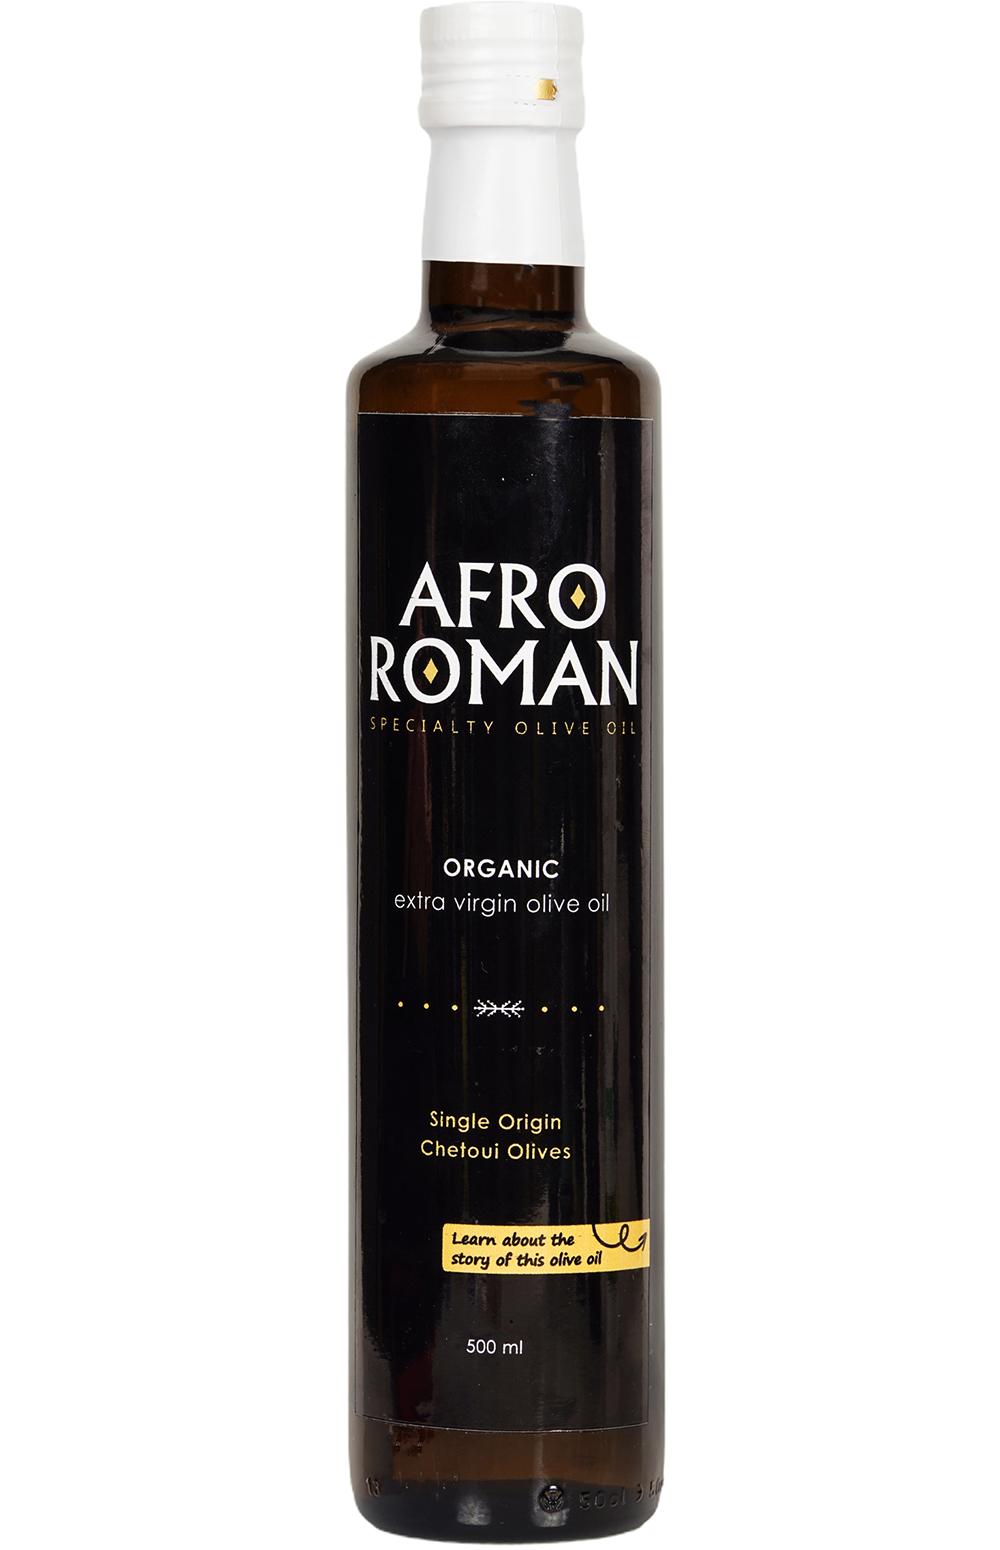 Afro Roman